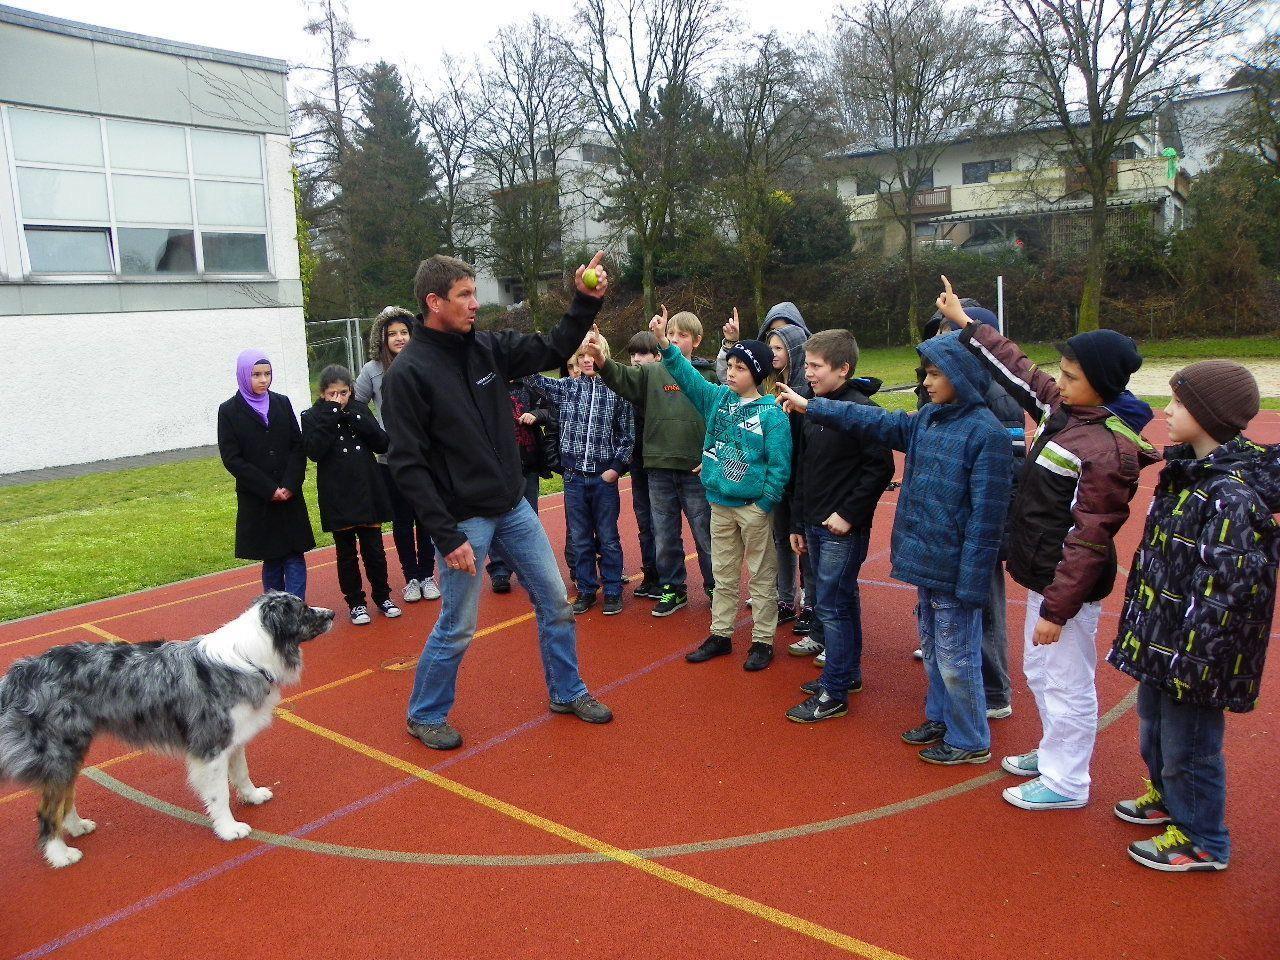 Hundetrainer  Dieter Prettenthaler  zeigt den richtigen Umgang mit Hunden